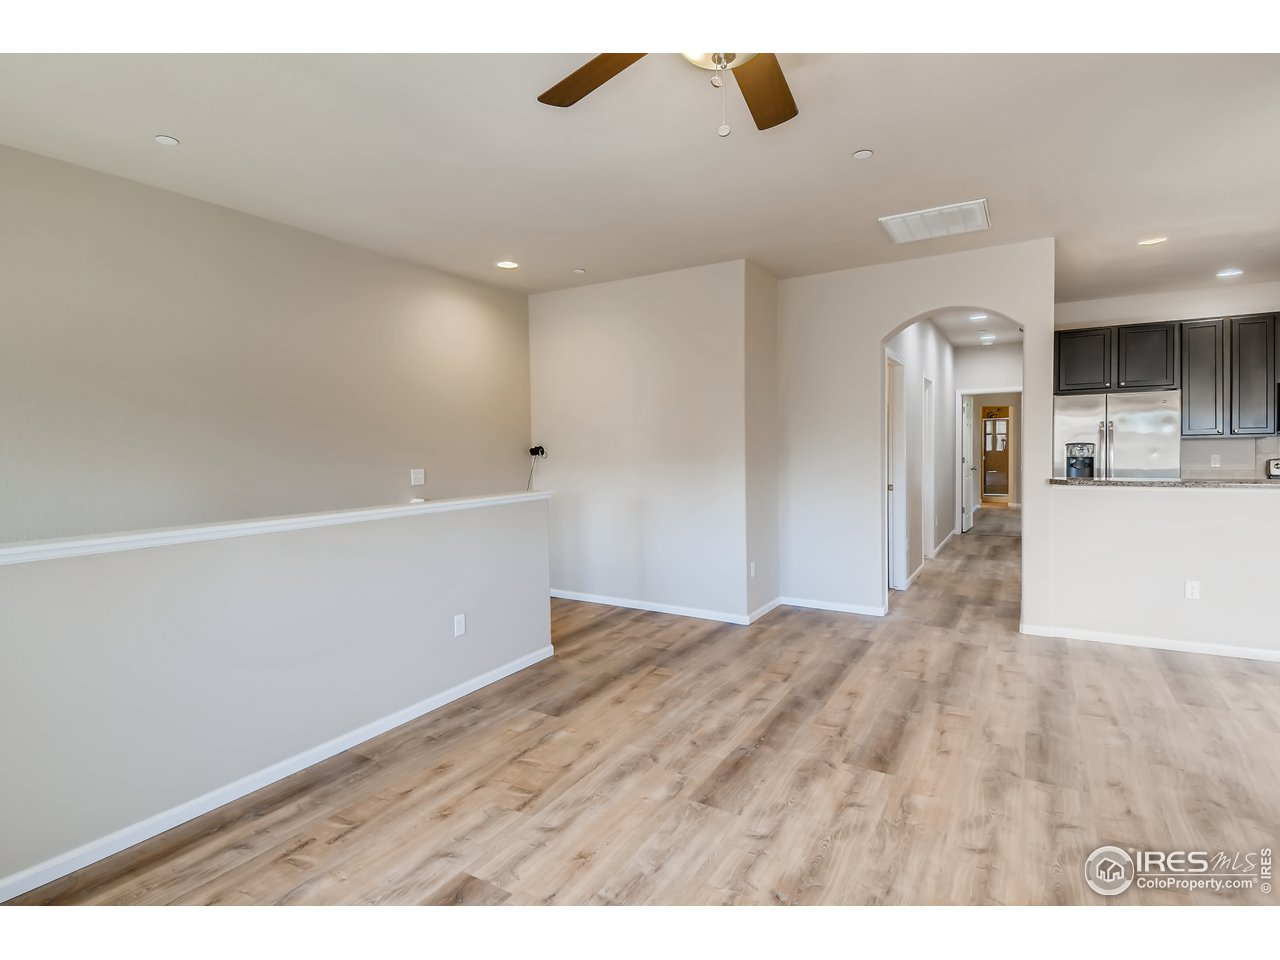 Beautiful laminate floors throughout